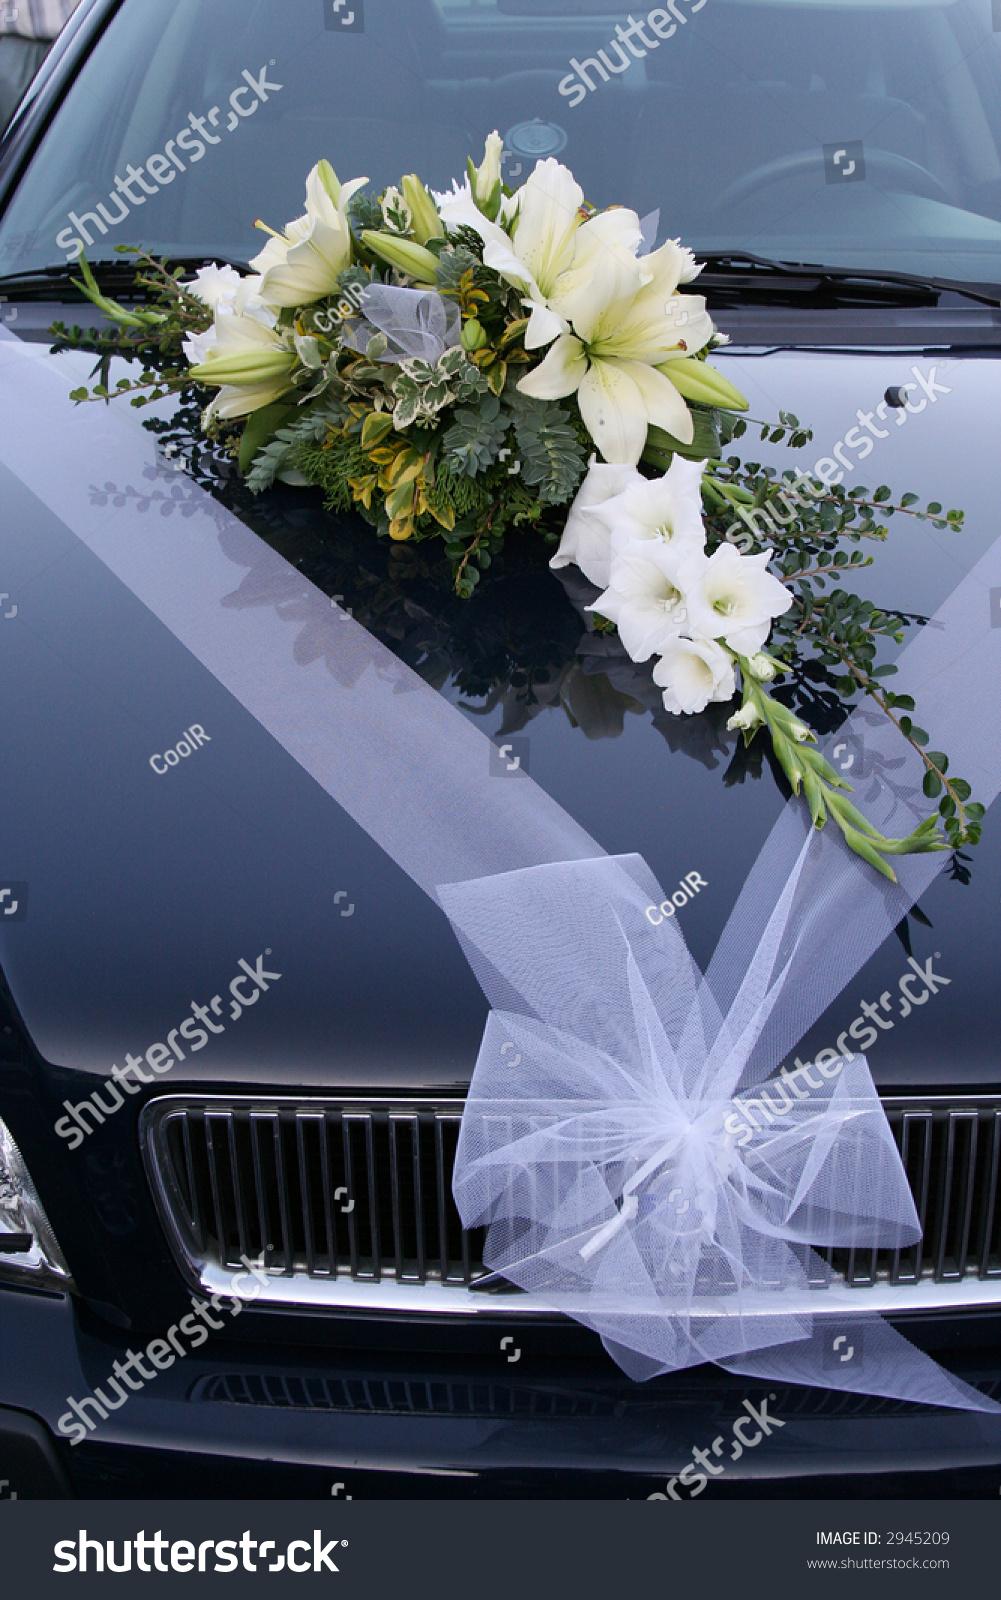 This Wedding Car Decoration Flower Bouquet Stock Photo Edit